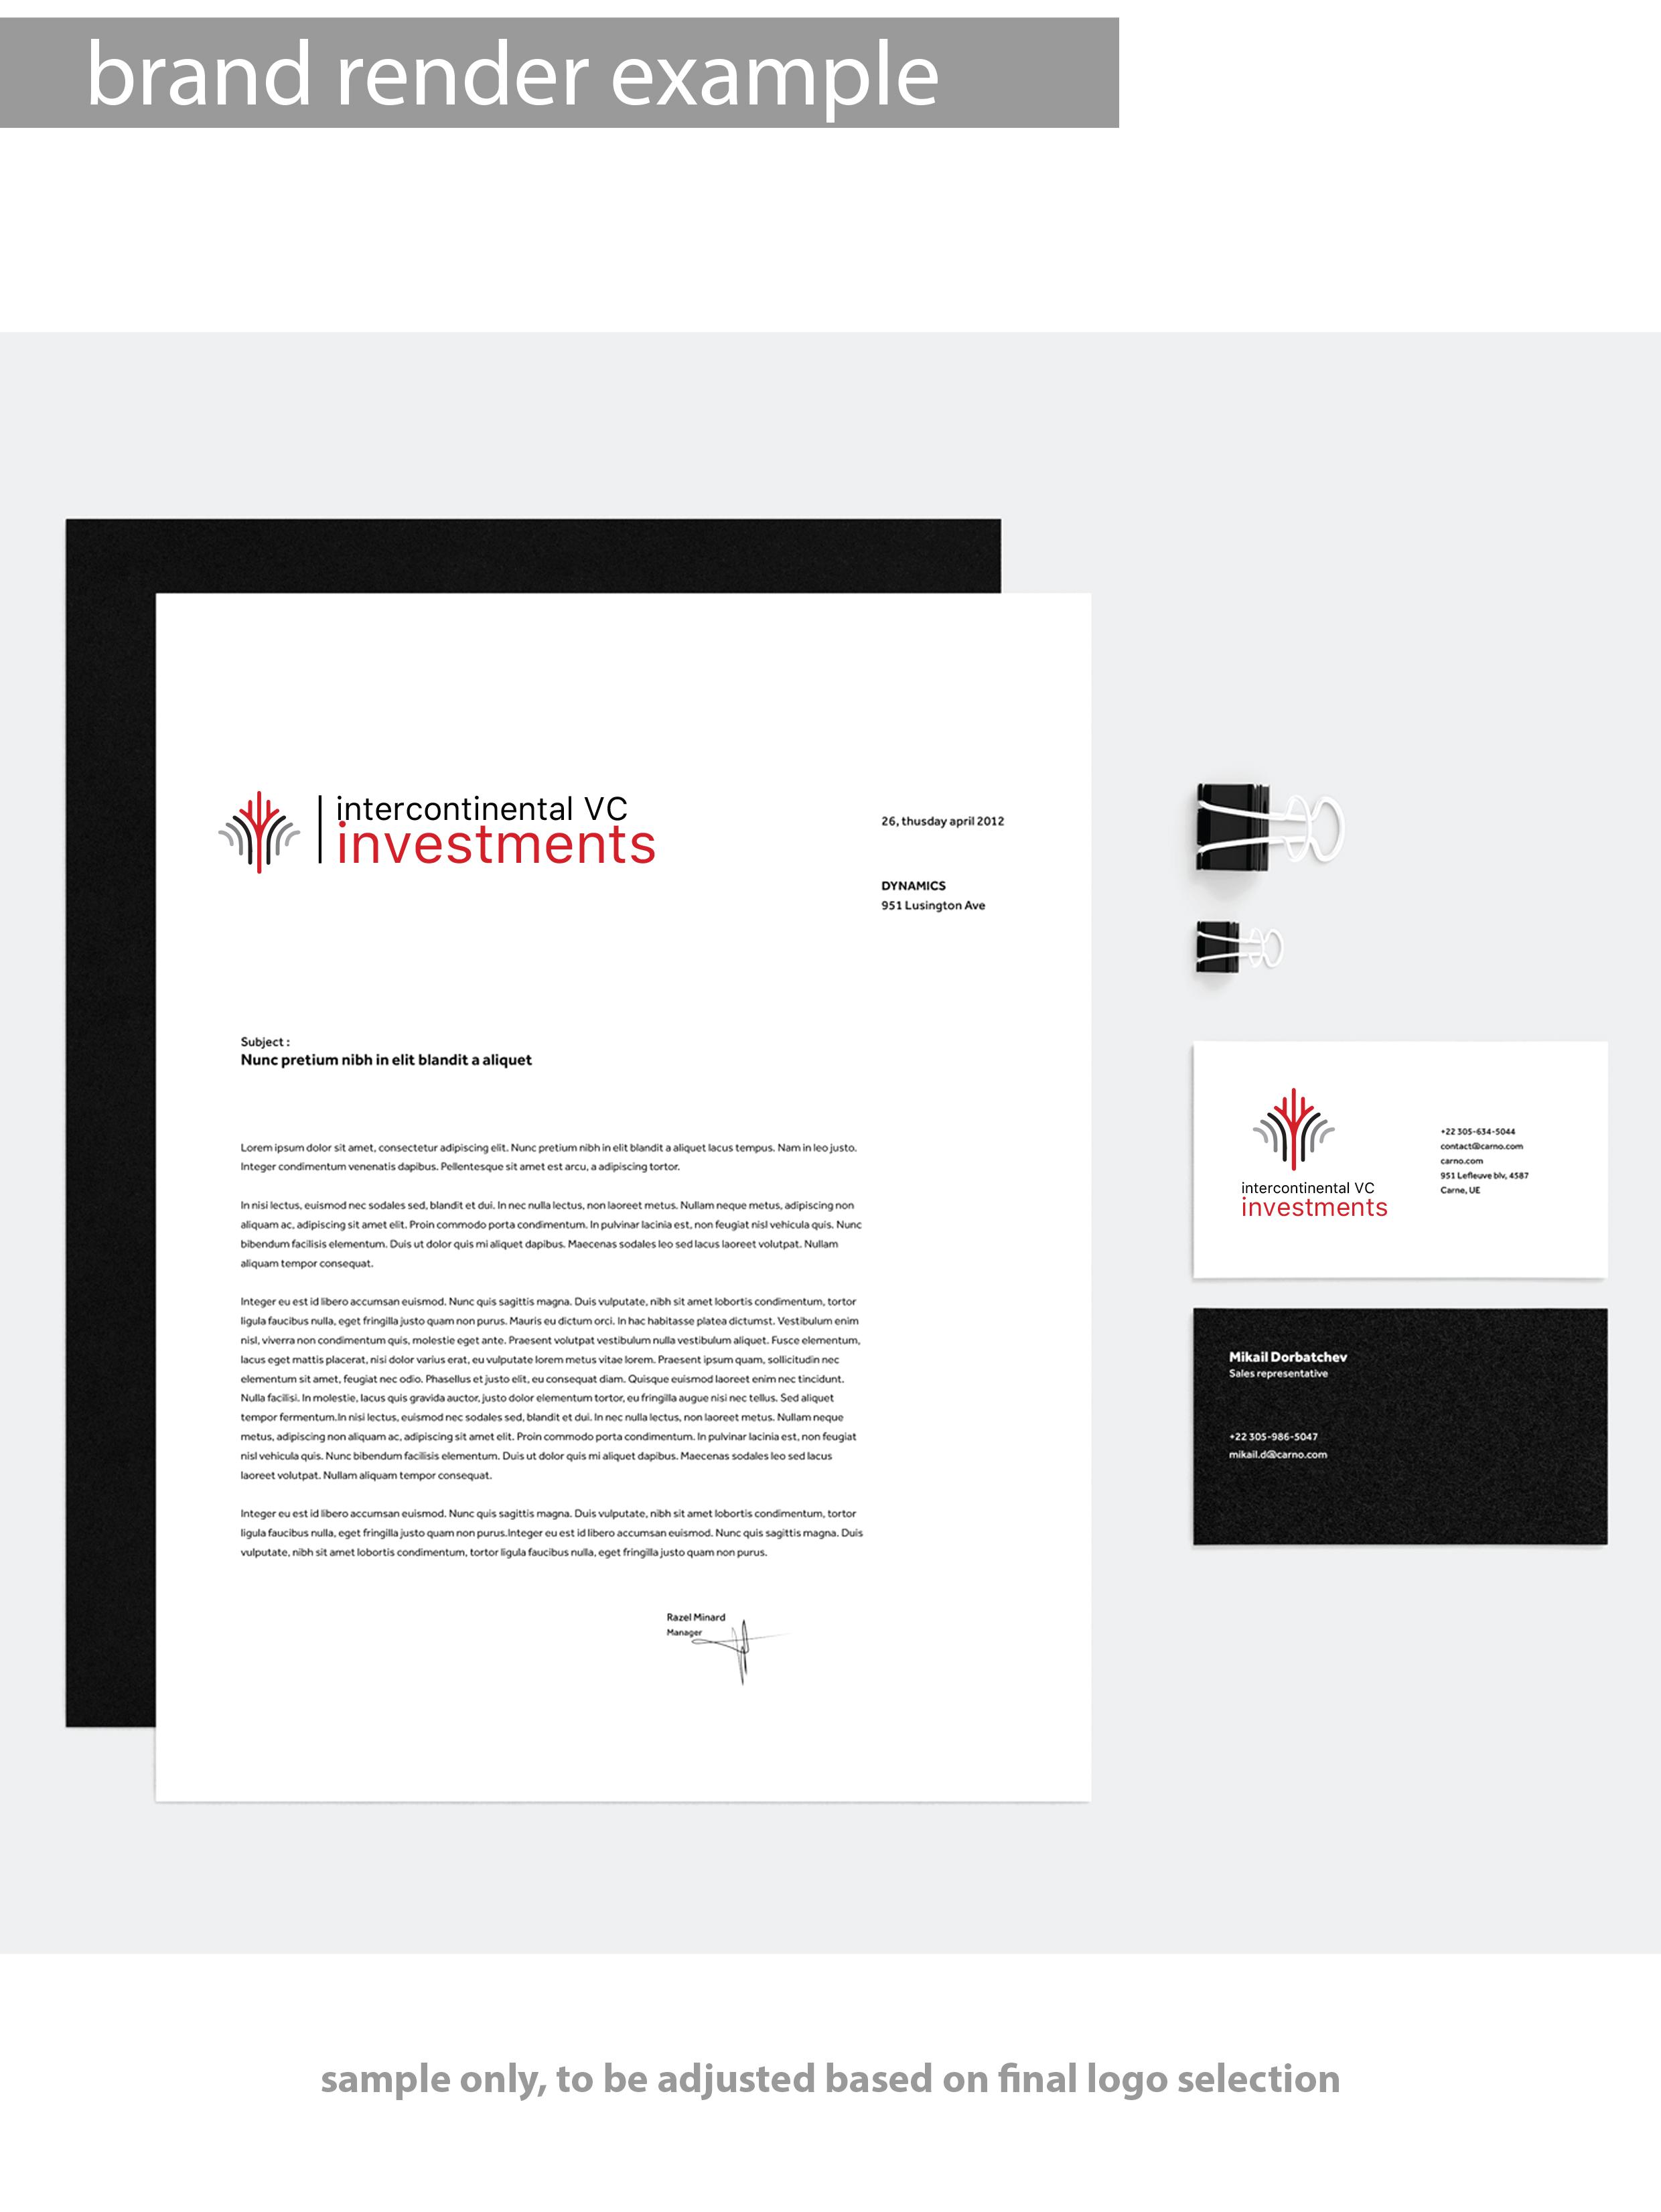 Intercontinental-VC-Brand-copy-3